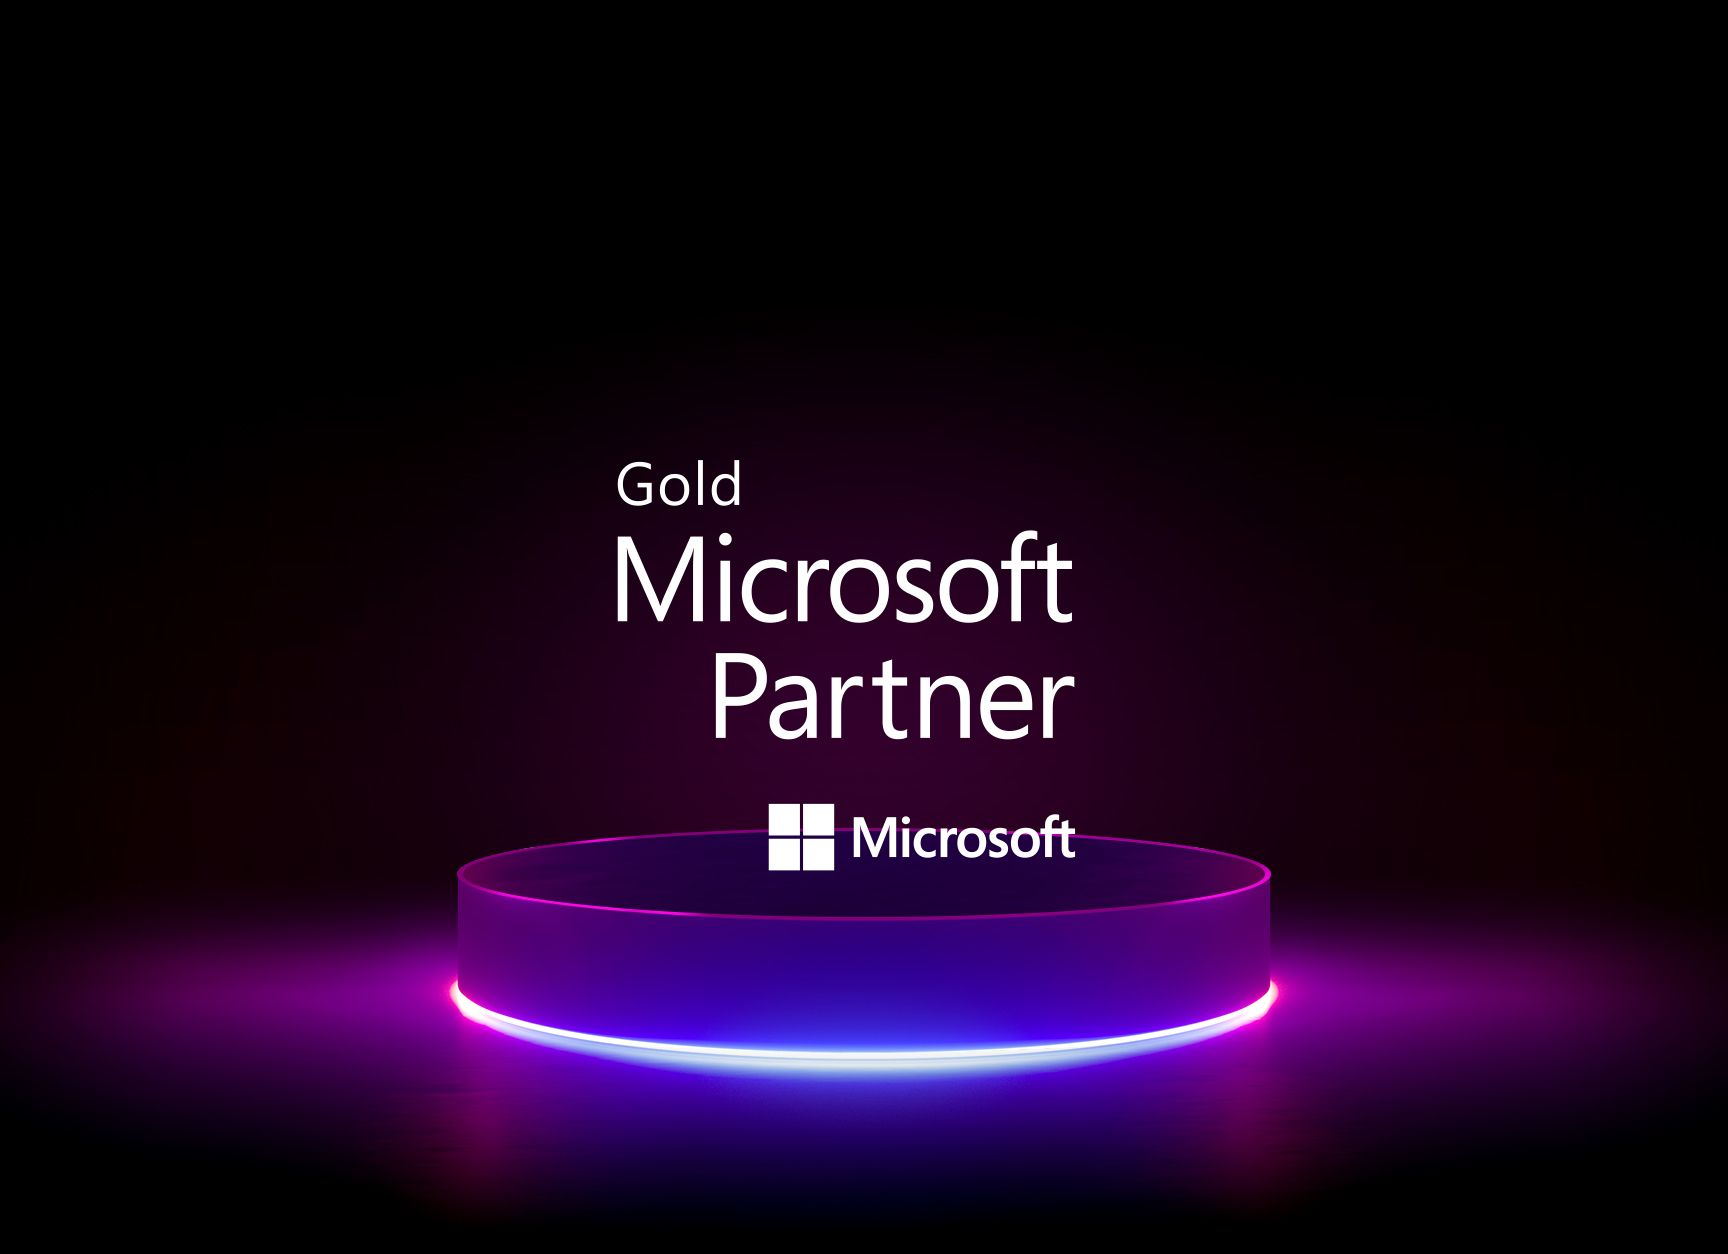 diva-e erreicht Microsoft-Gold-Partner-Status in mehreren Disziplinen